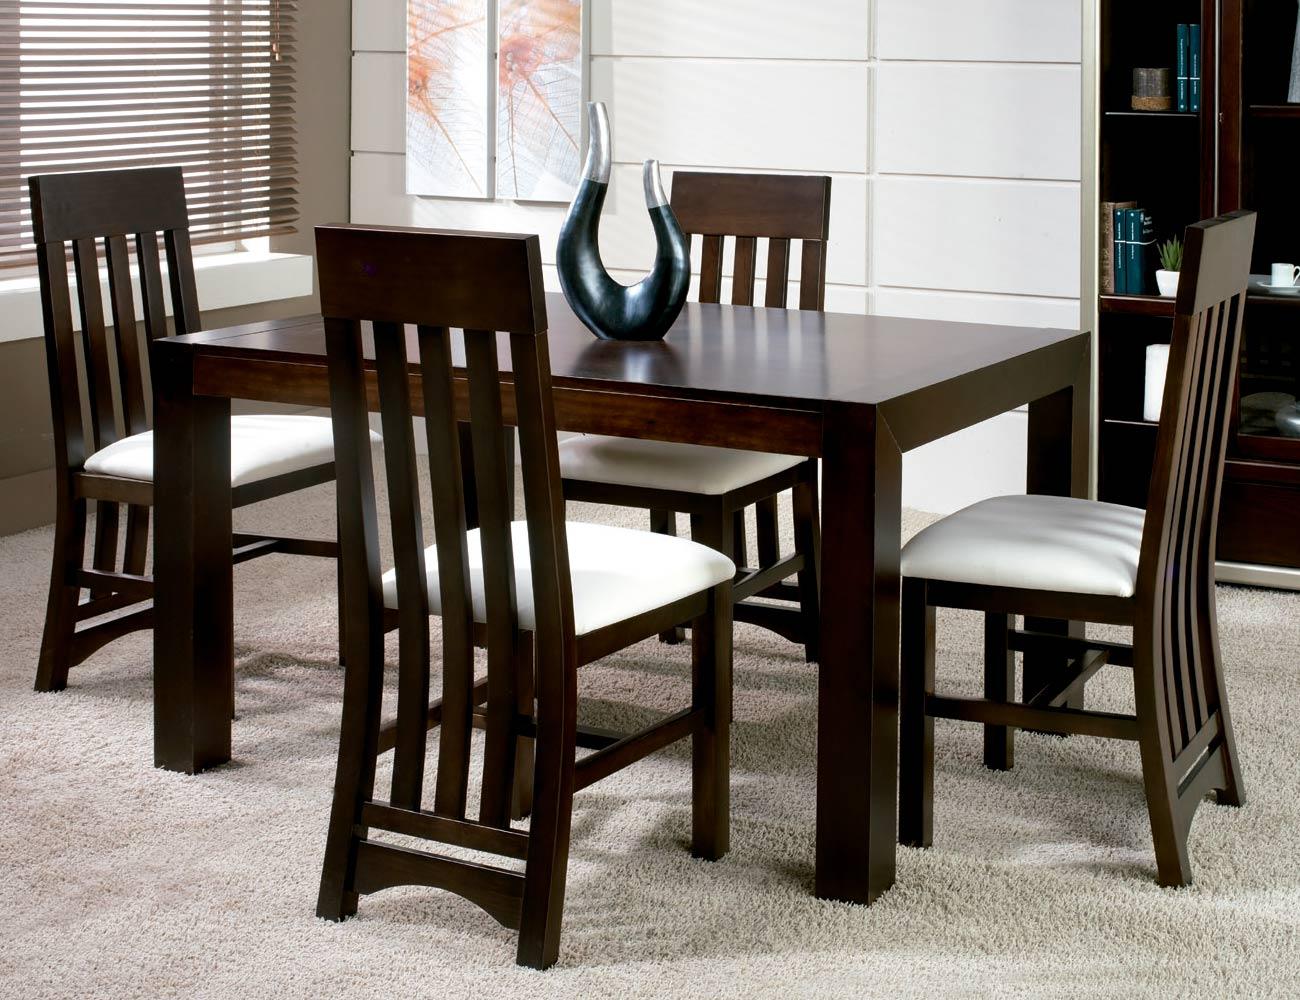 Composicion14 mesa sillas1